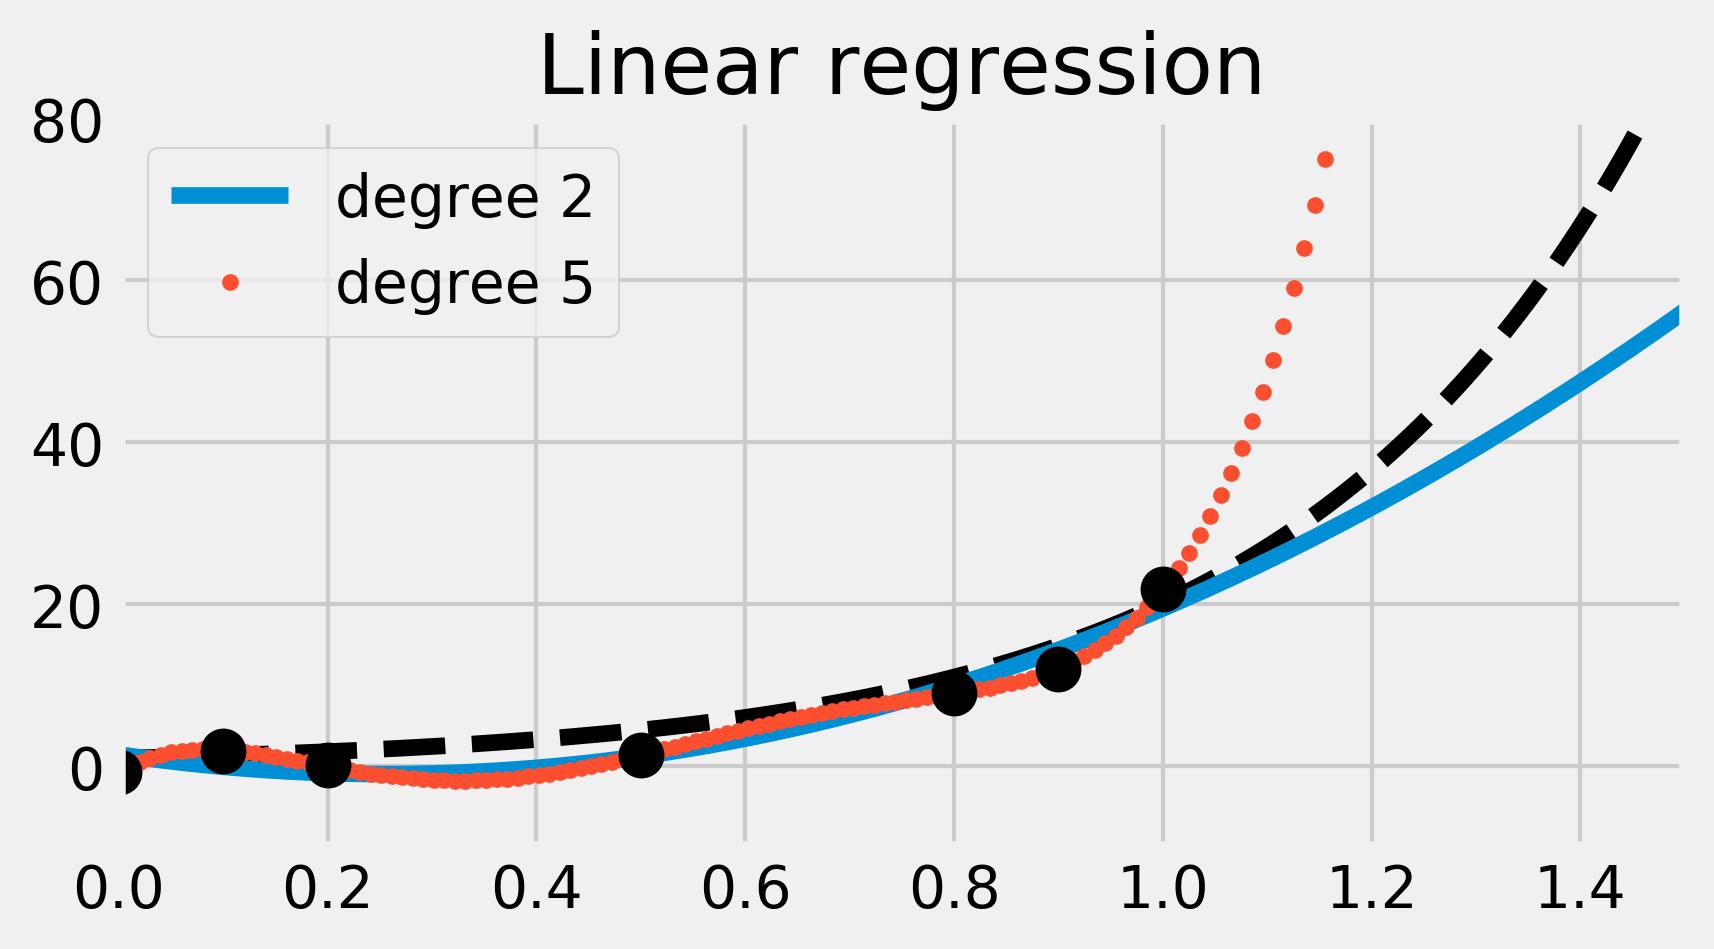 <matplotlib.figure.Figure at 0x82d34a8>